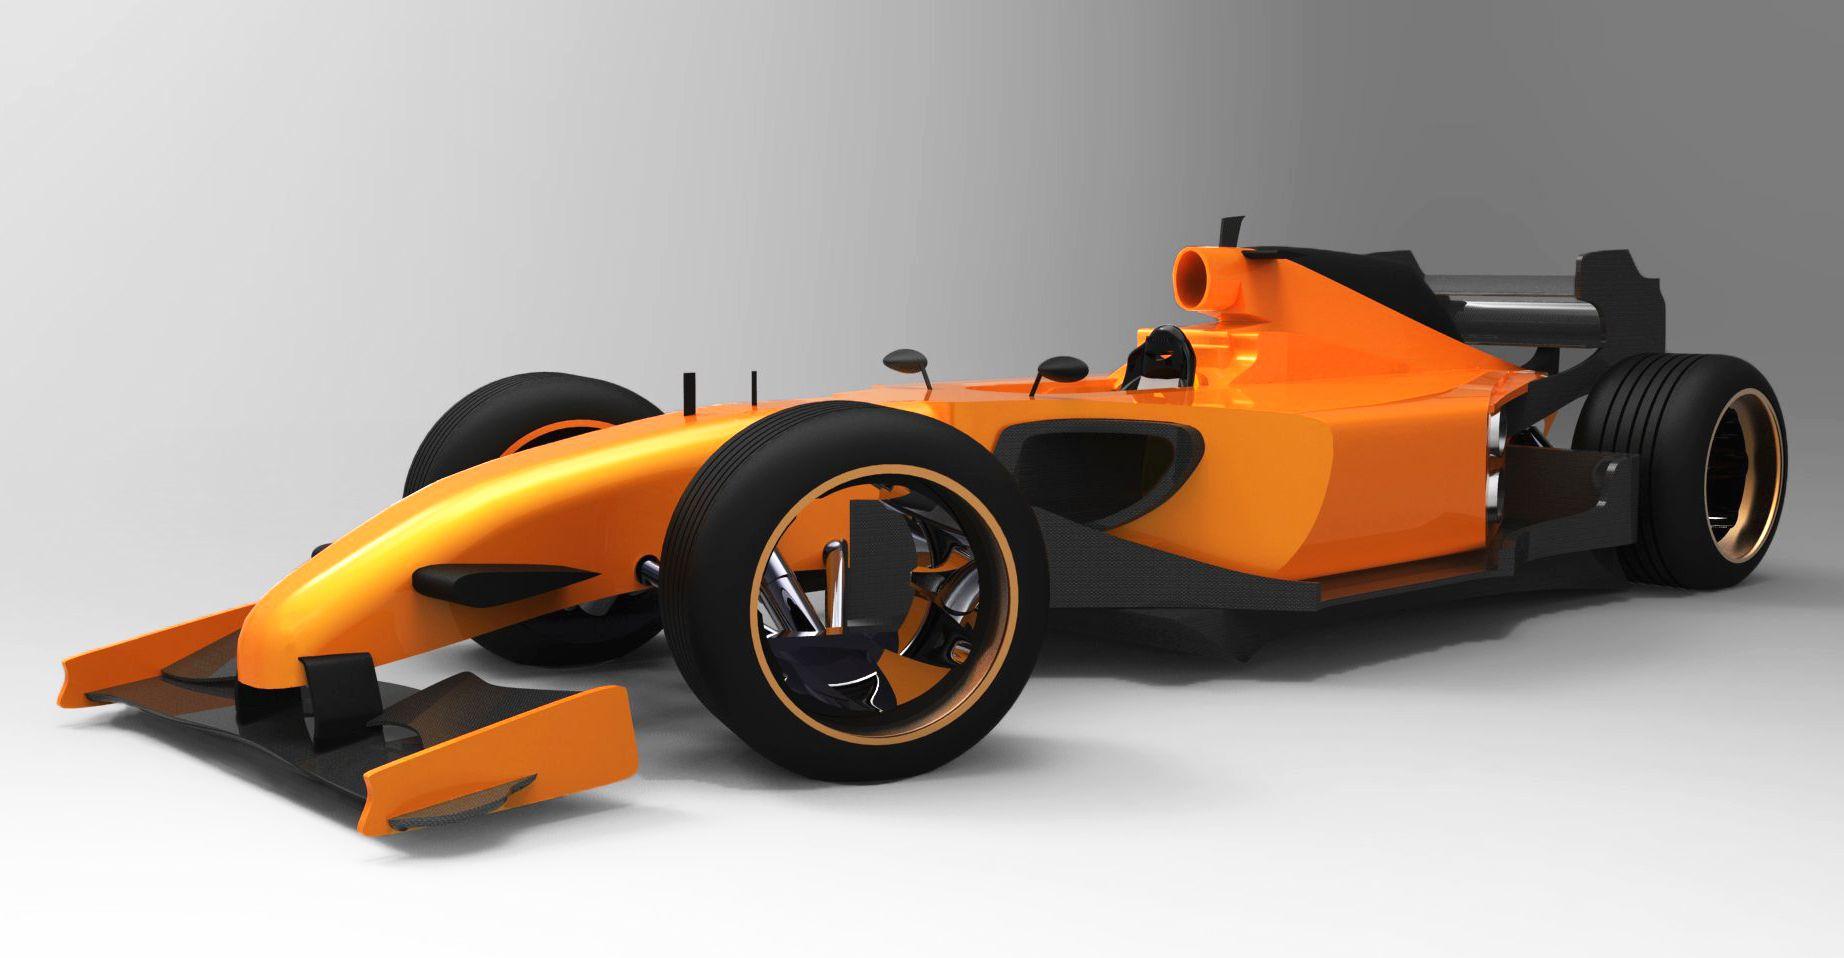 2014 F1 Car Design Concept Redesigned Cars Race